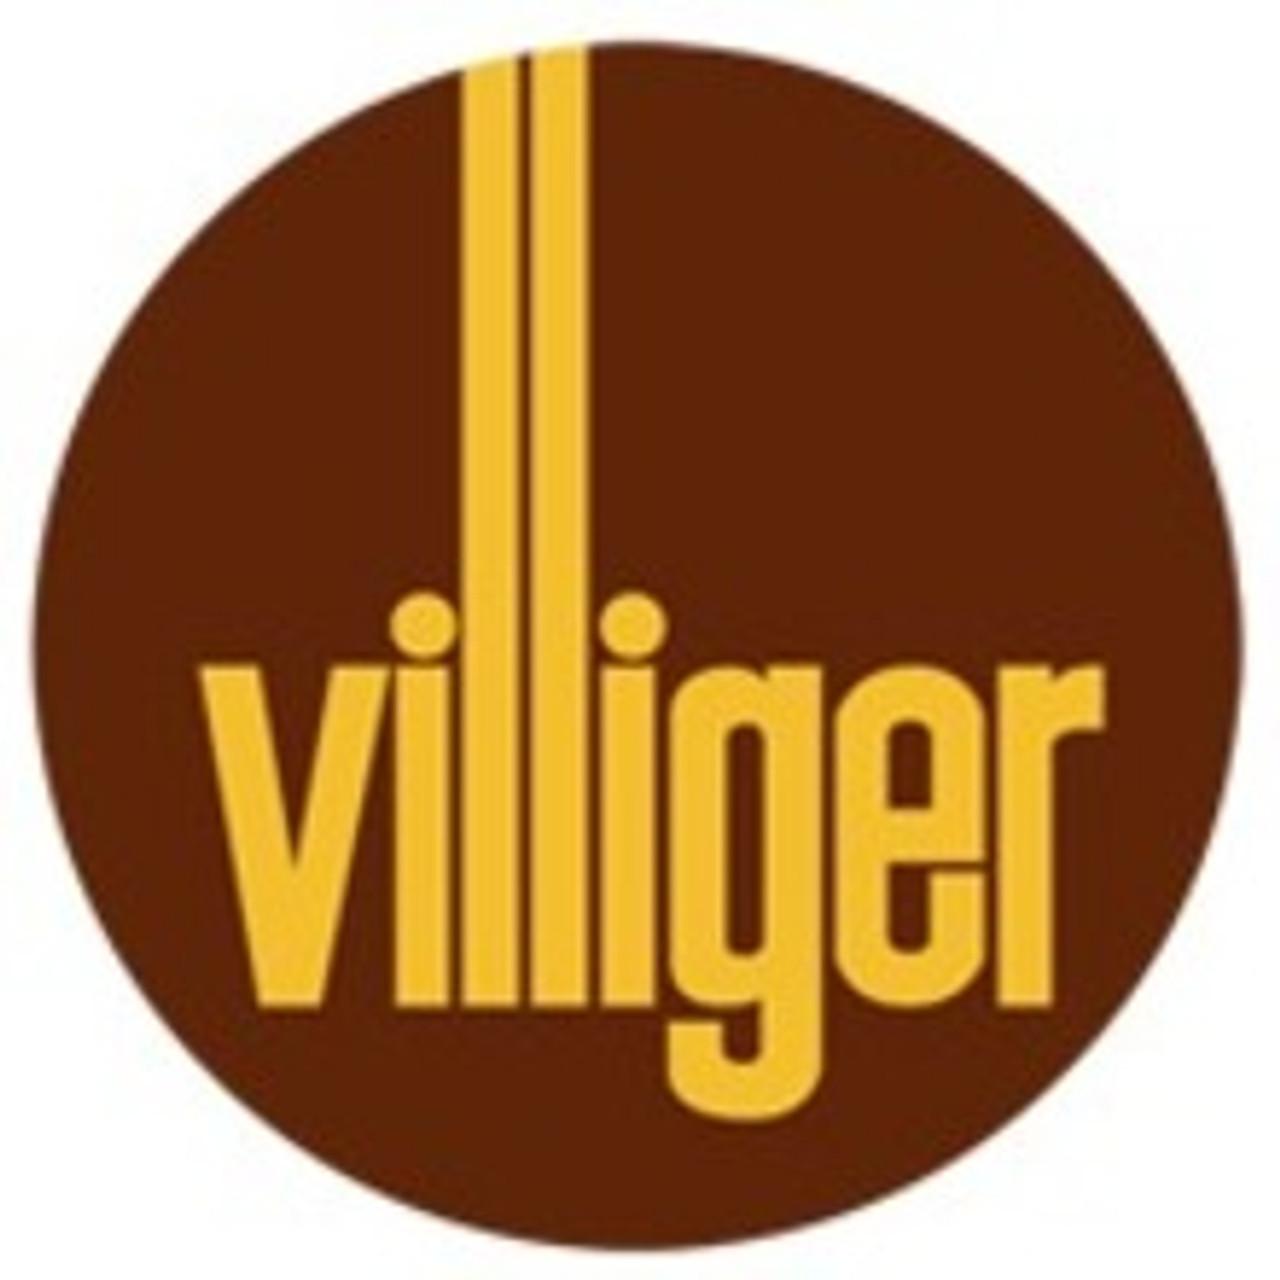 Villiger Braniff #3 Cigars (5 Packs of 10)